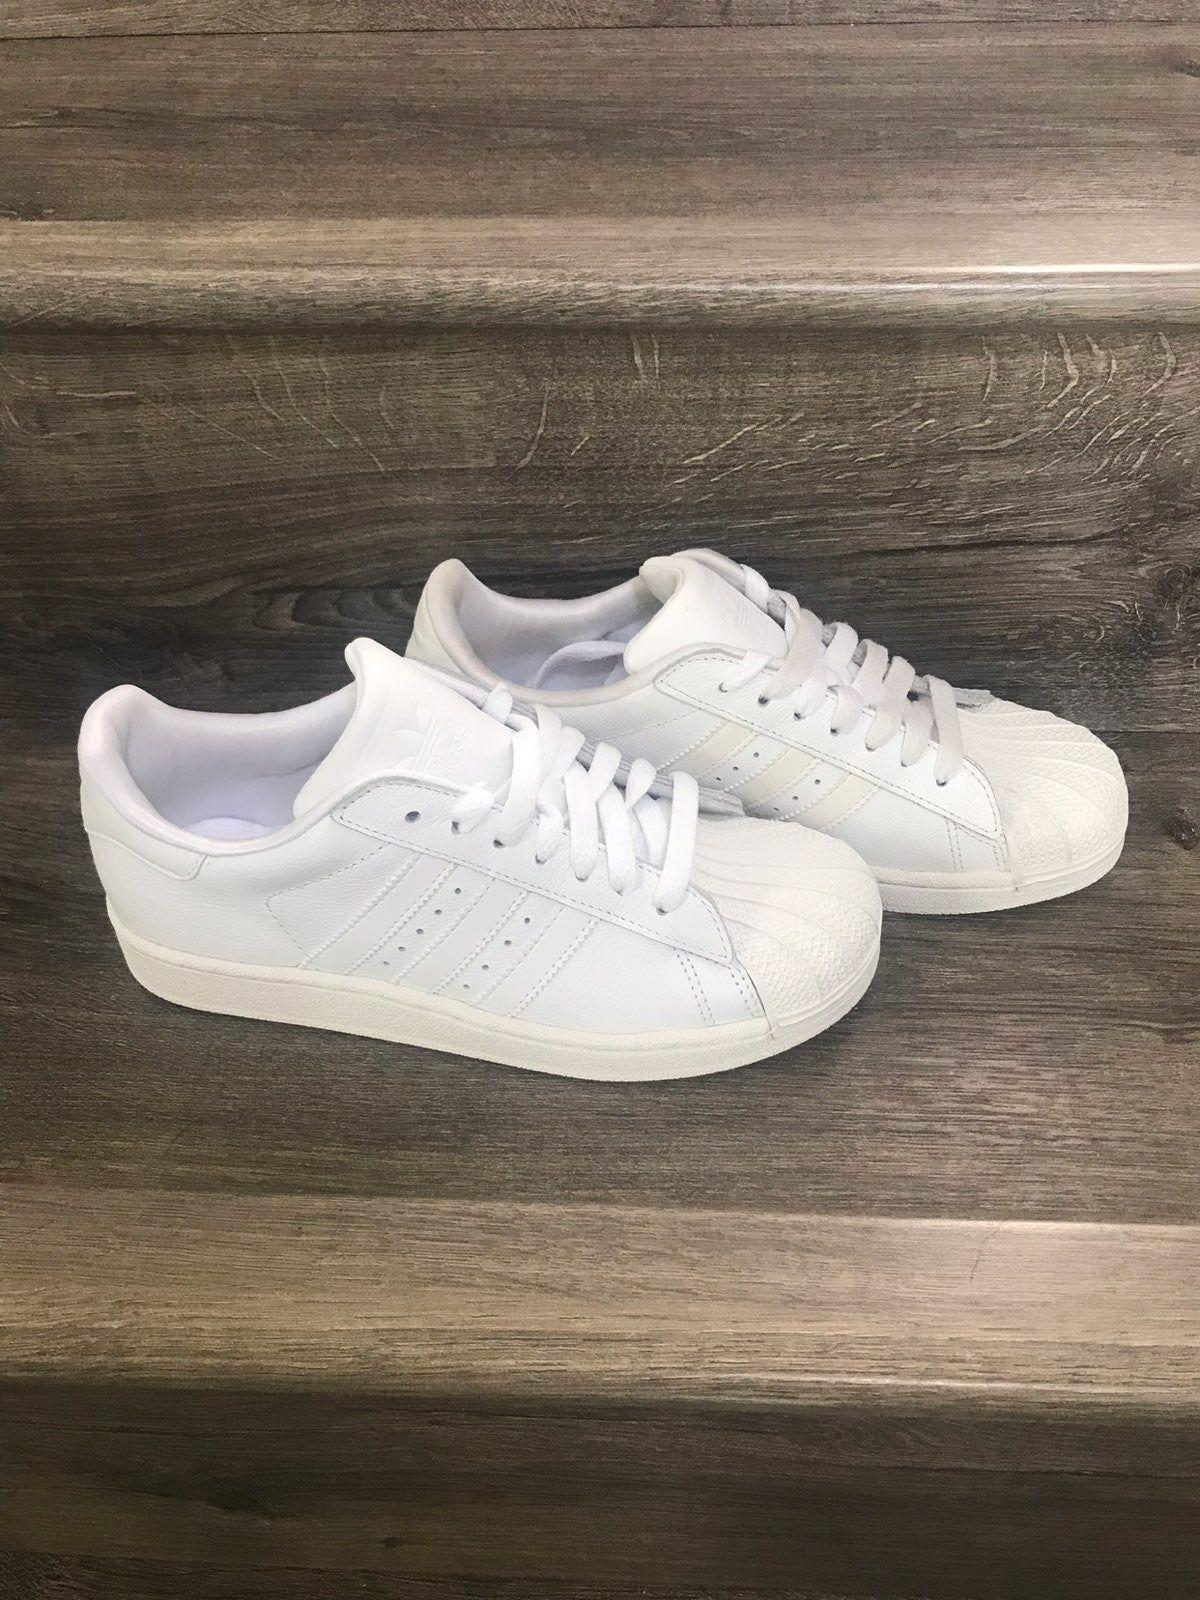 youth adidas superstar Left shoe